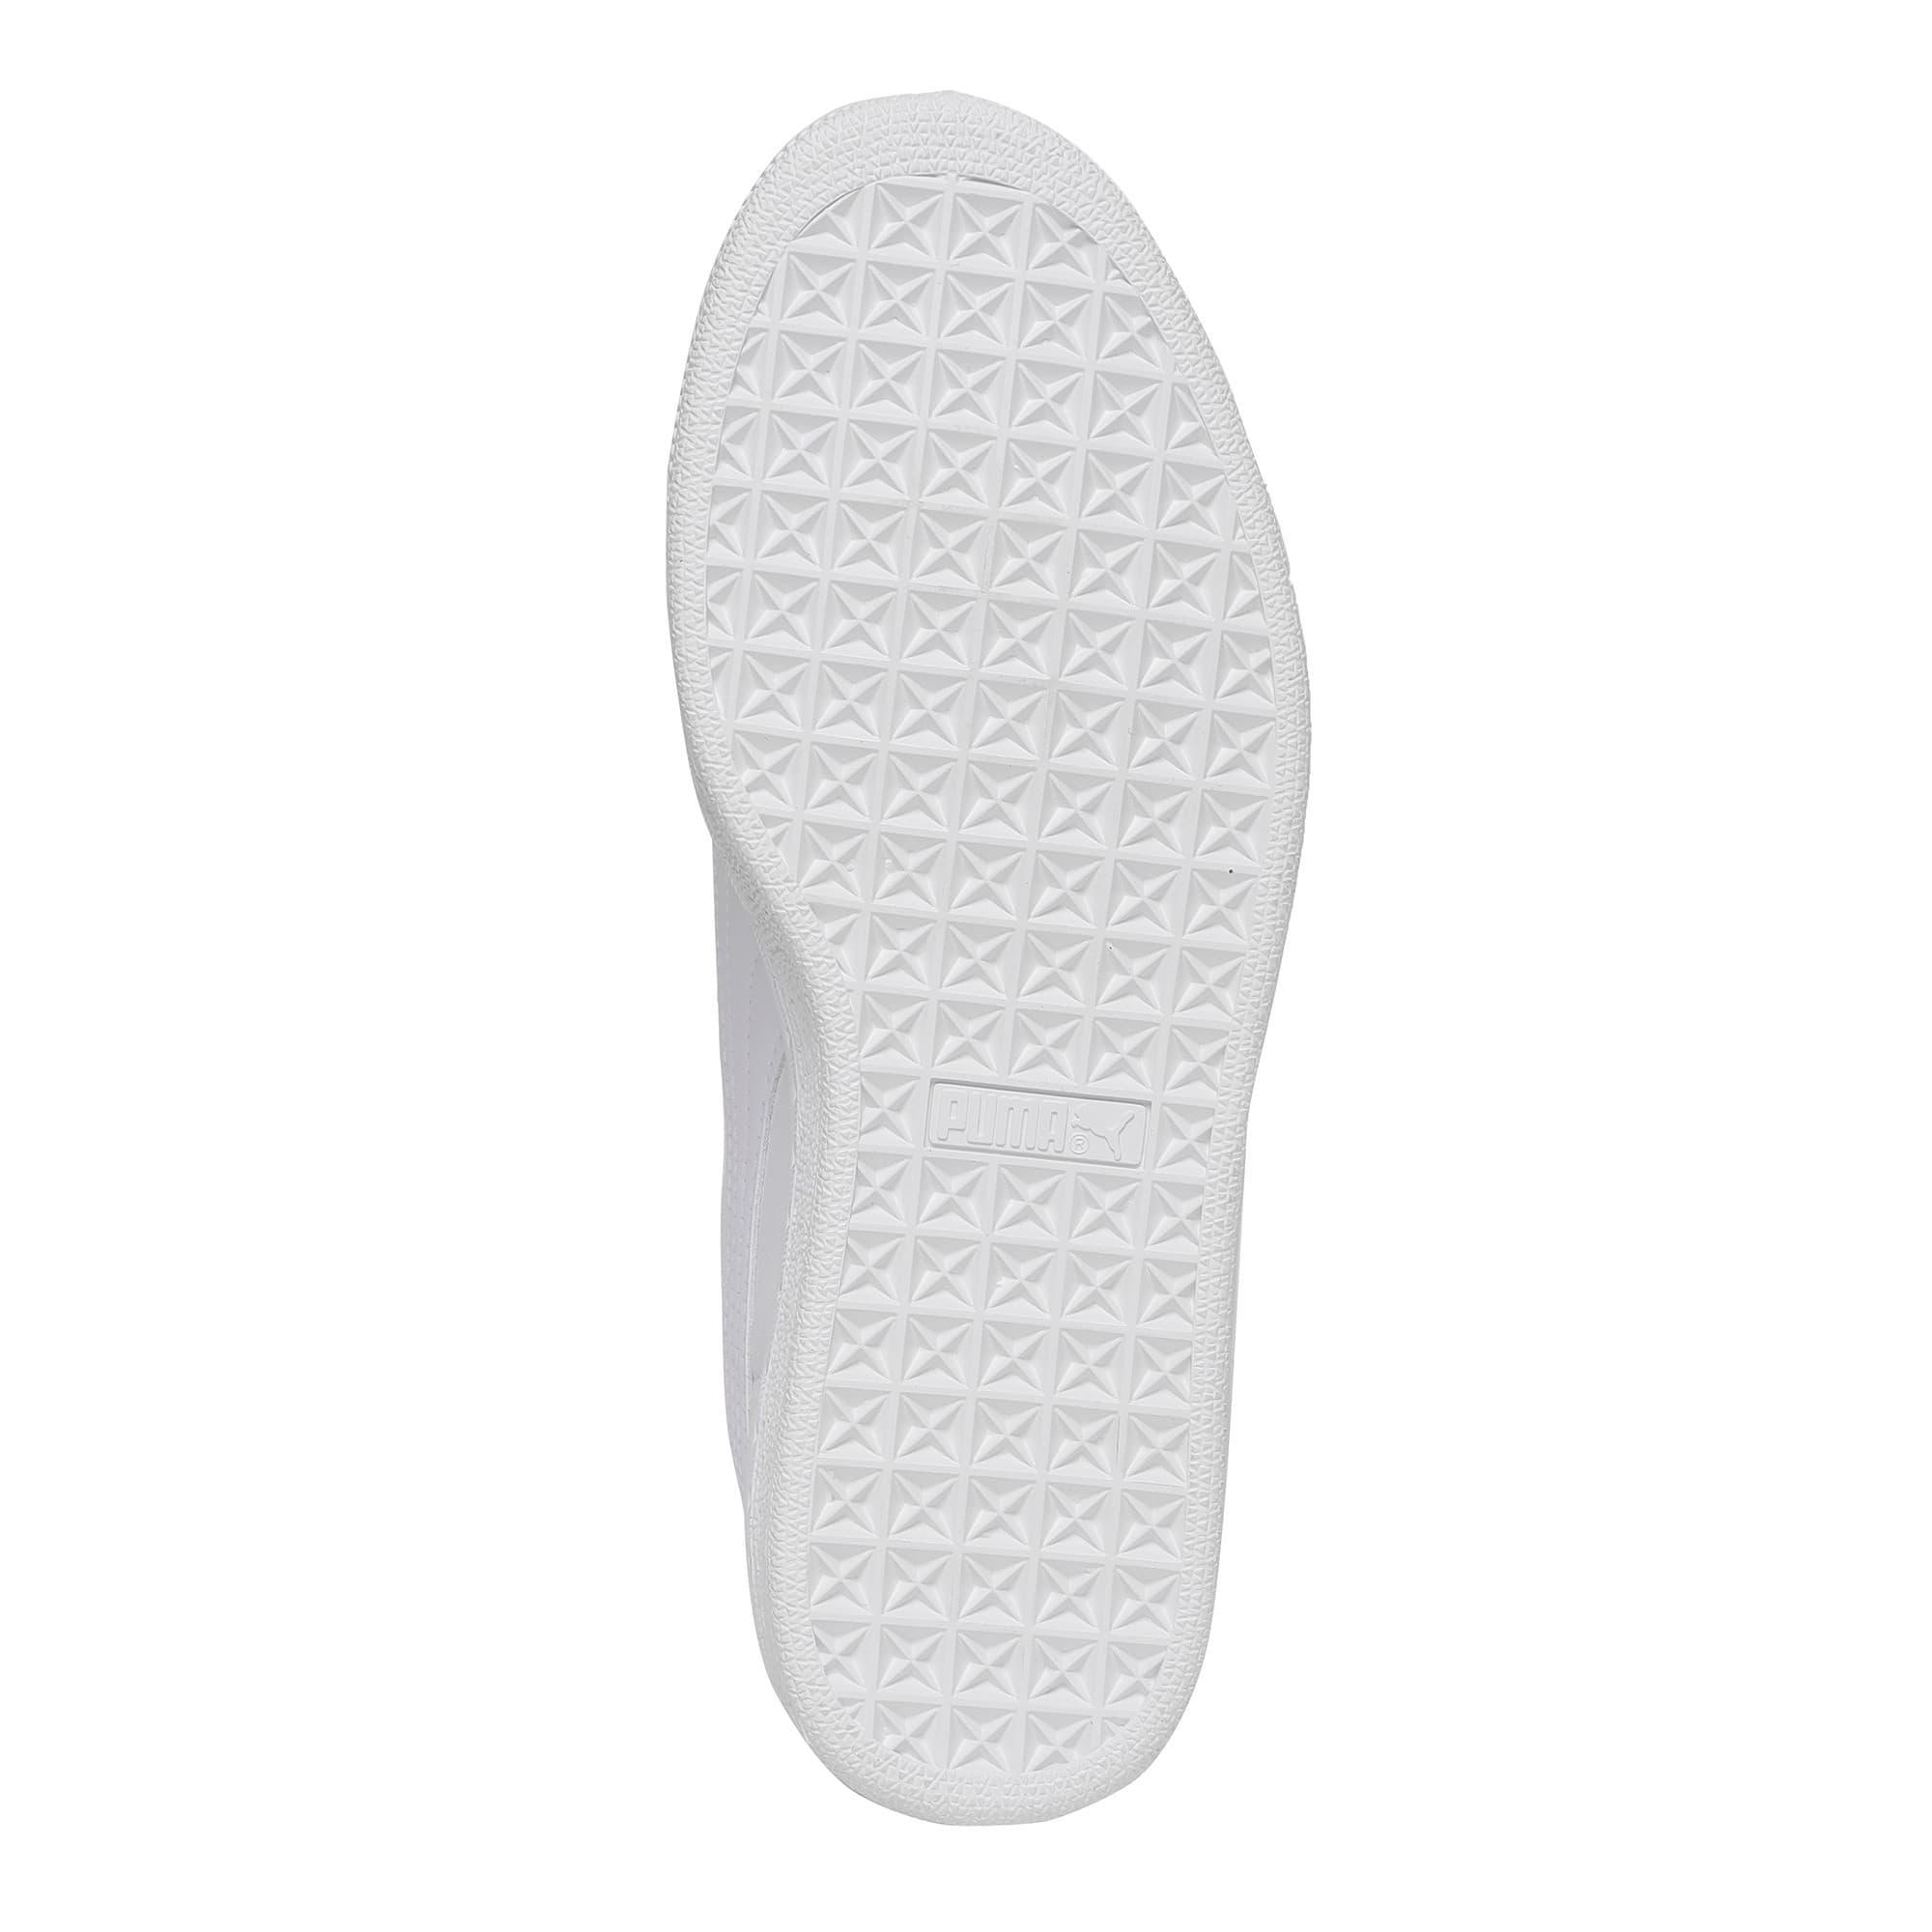 Thumbnail 3 of Basket Heart Gen Hustle Women's Sneakers, Puma White-Fair Aqua, medium-IND